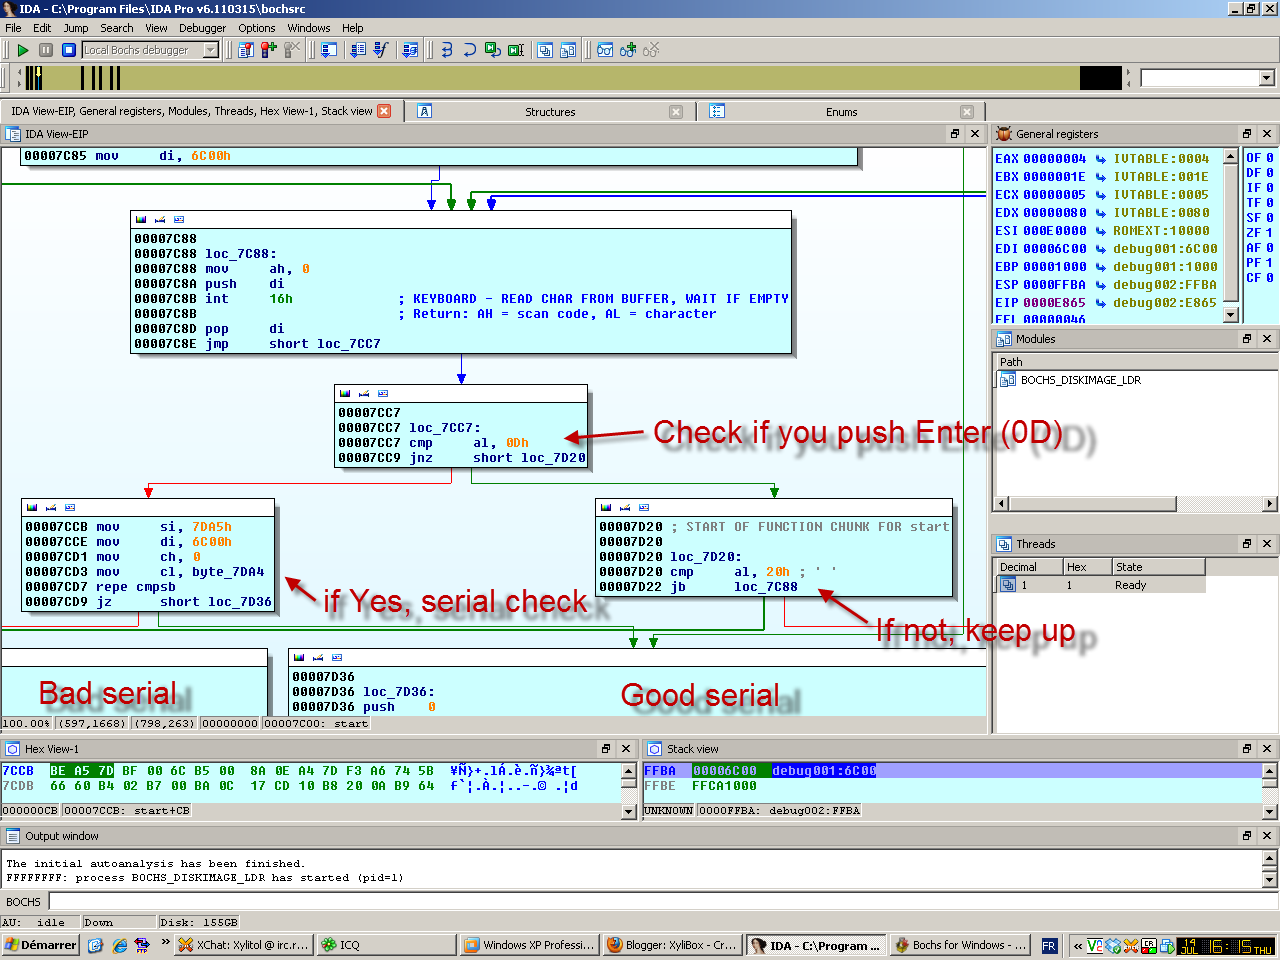 IDA Pro 7.2 Leaked Update full version